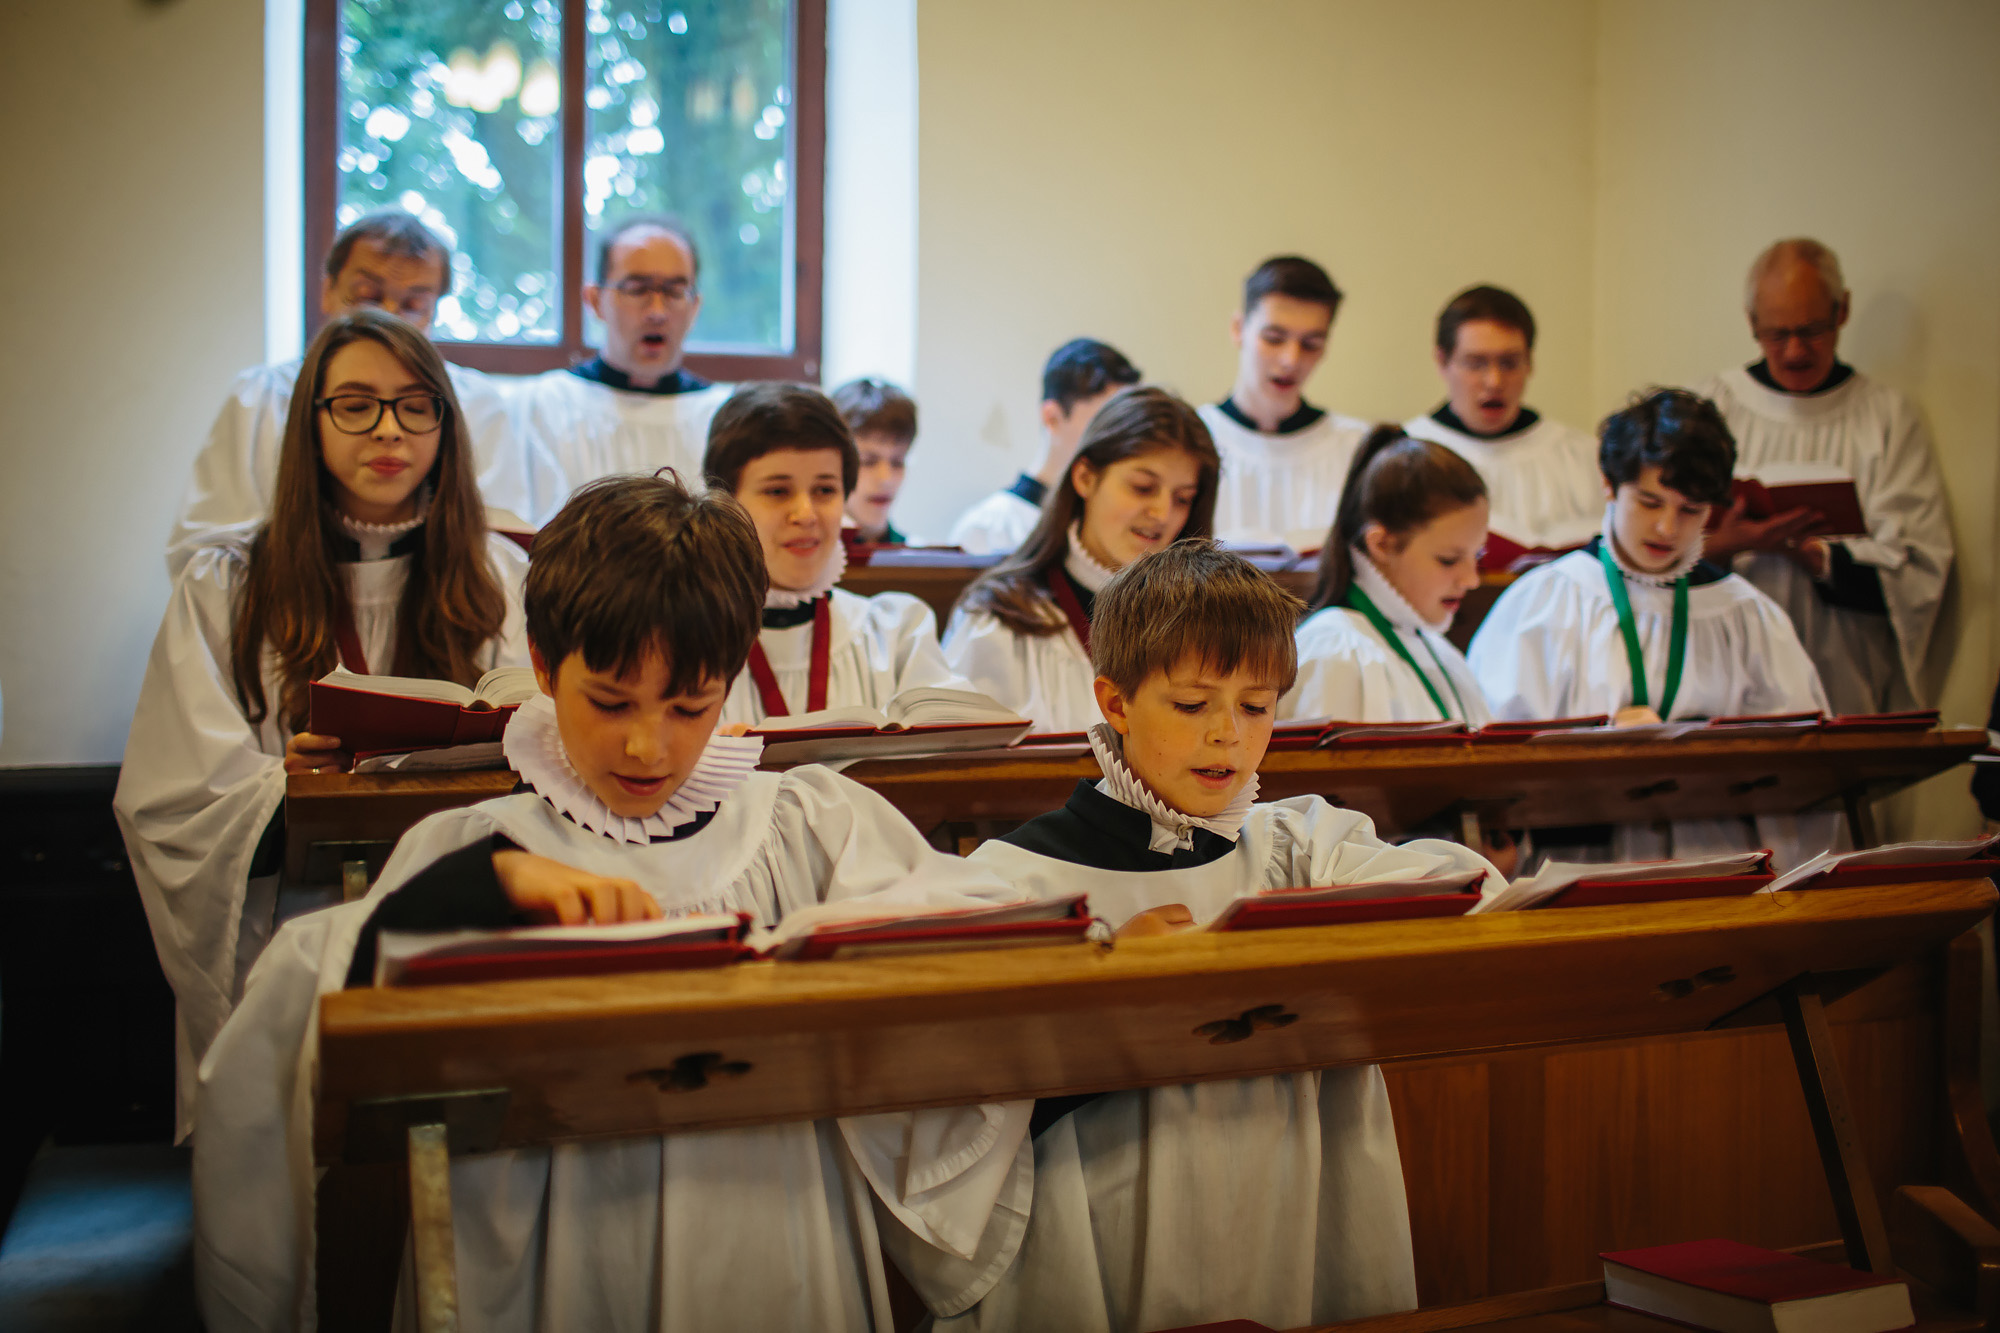 Choir singing hymns at a church wedding